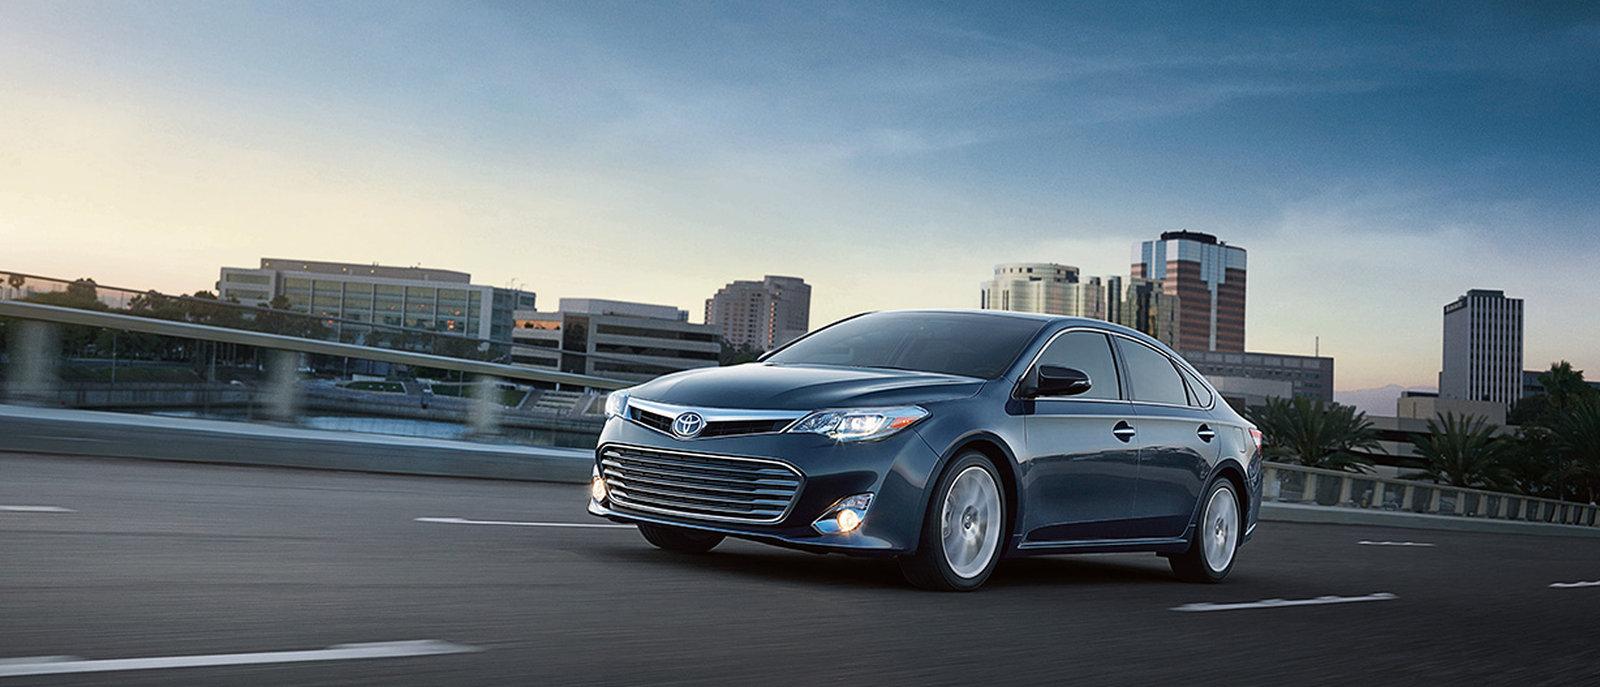 2015 Toyota Avalon Hybrid exterior slider